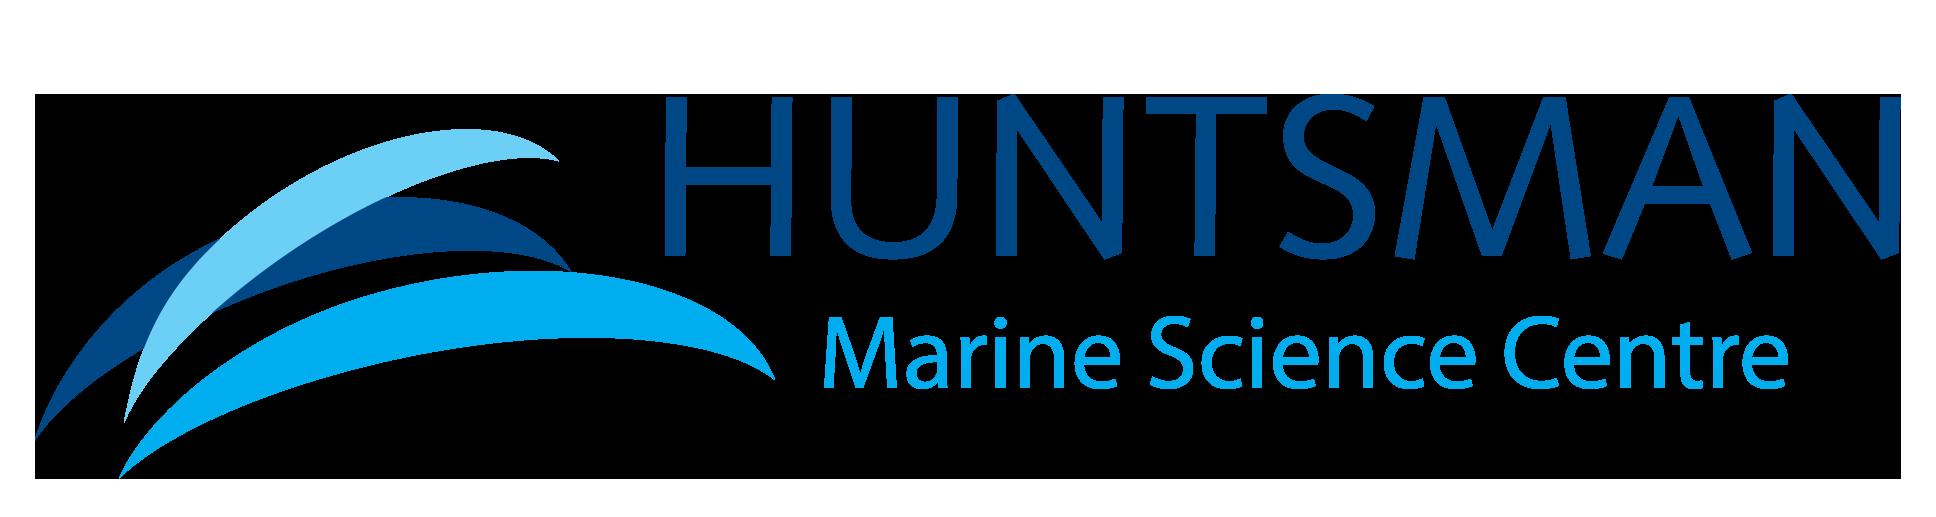 Huntsman Marine